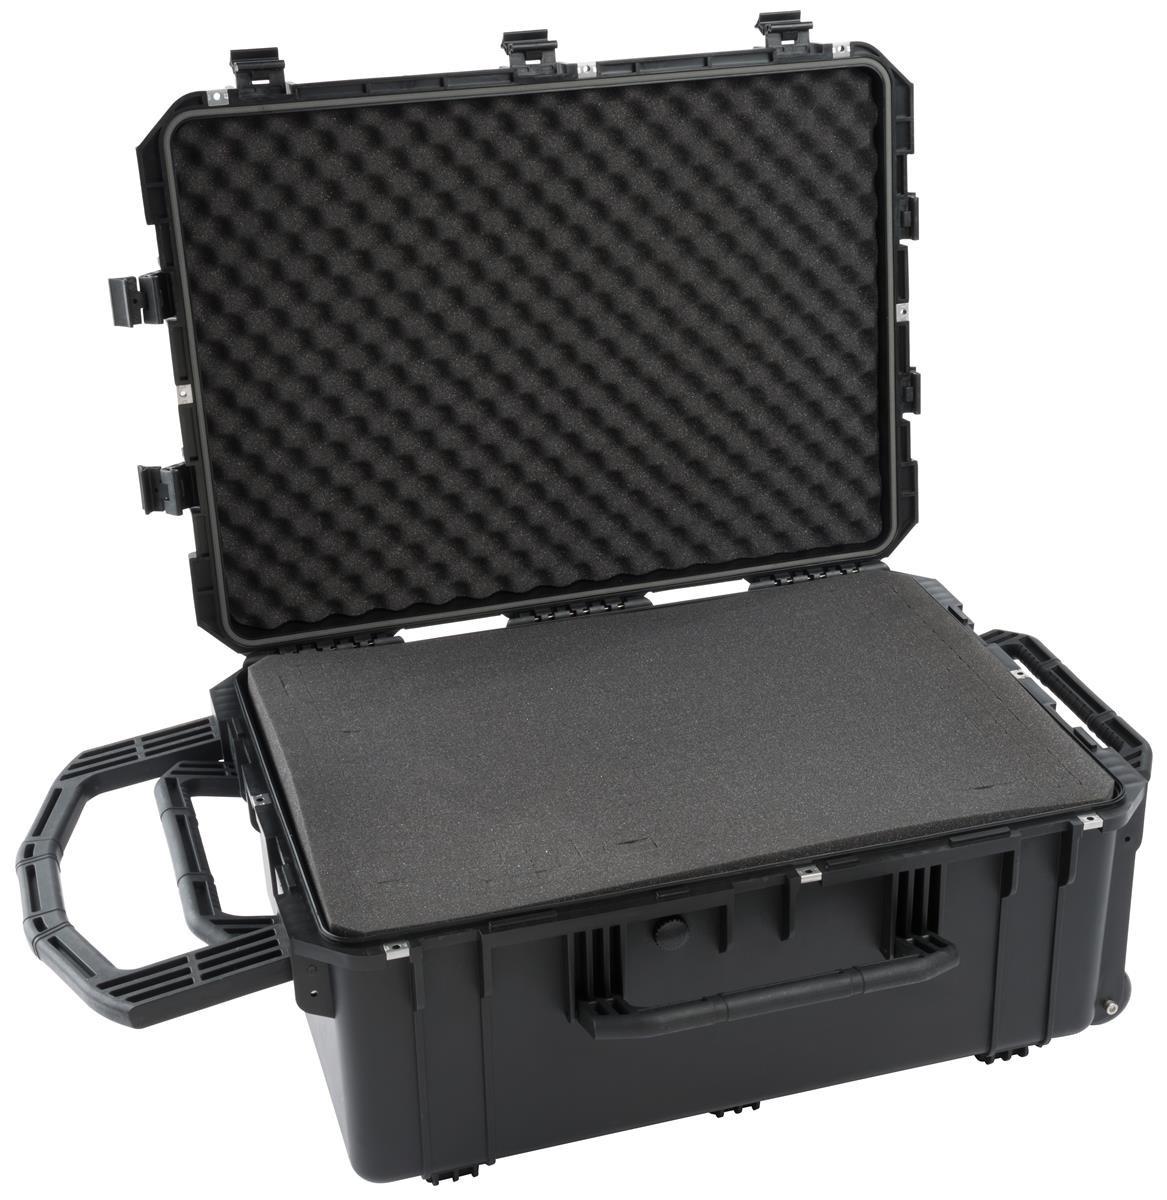 Displays2go Equipment Case with Foam Pads and Air Pressure Release Valve – Black (JFFS01BK)